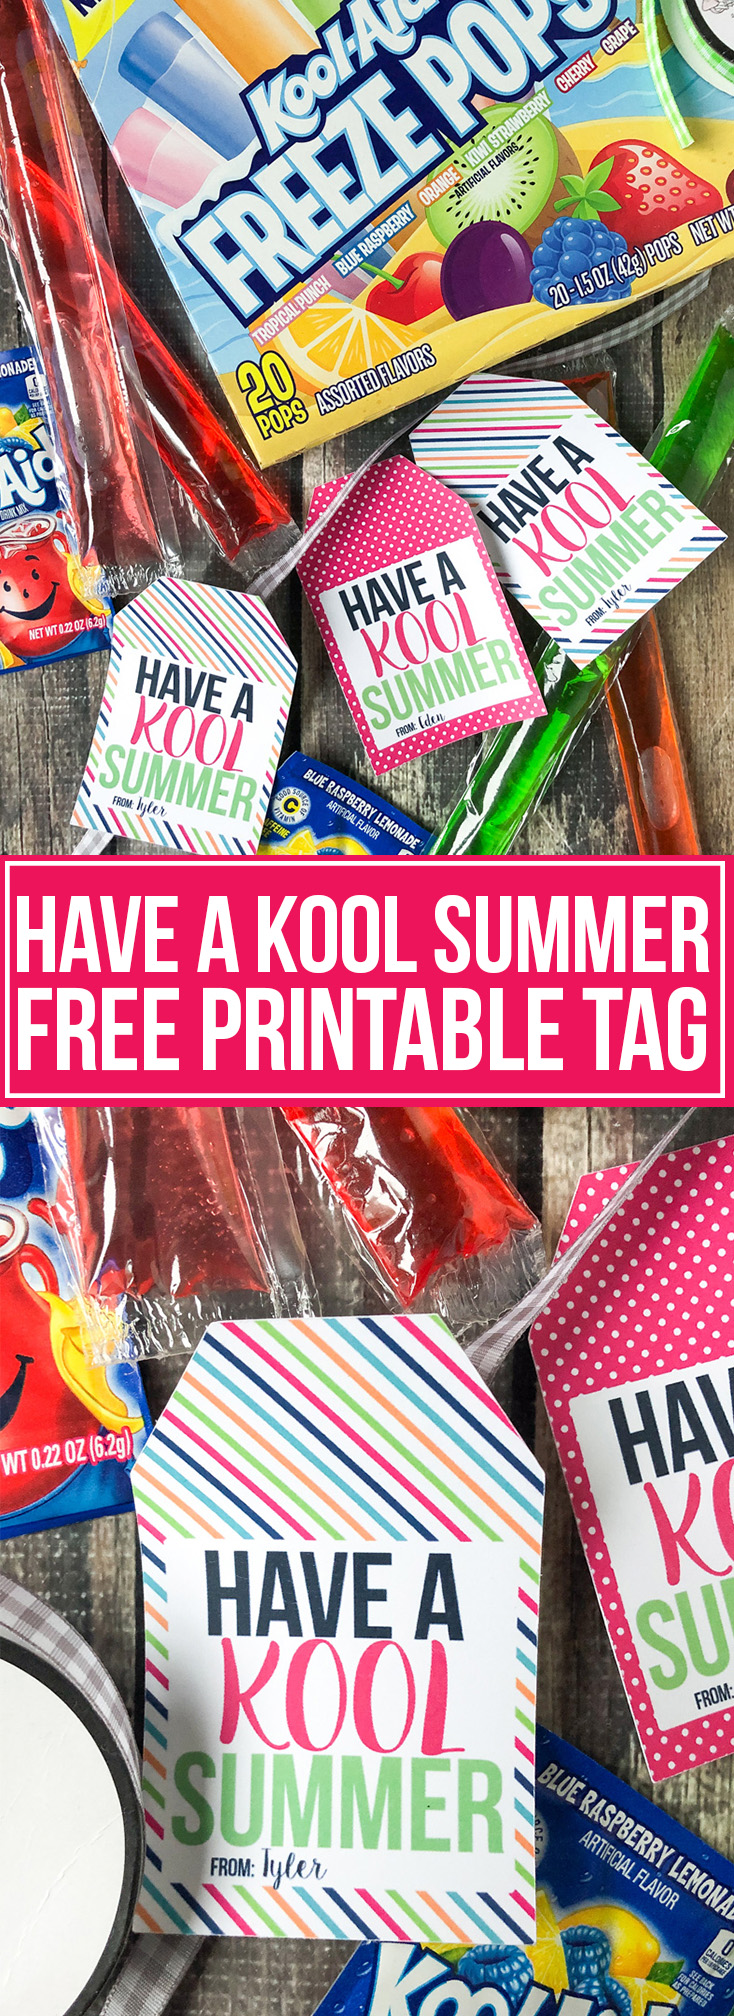 HAVE A KOOL SUMMER FREE PRINTABLE TAG